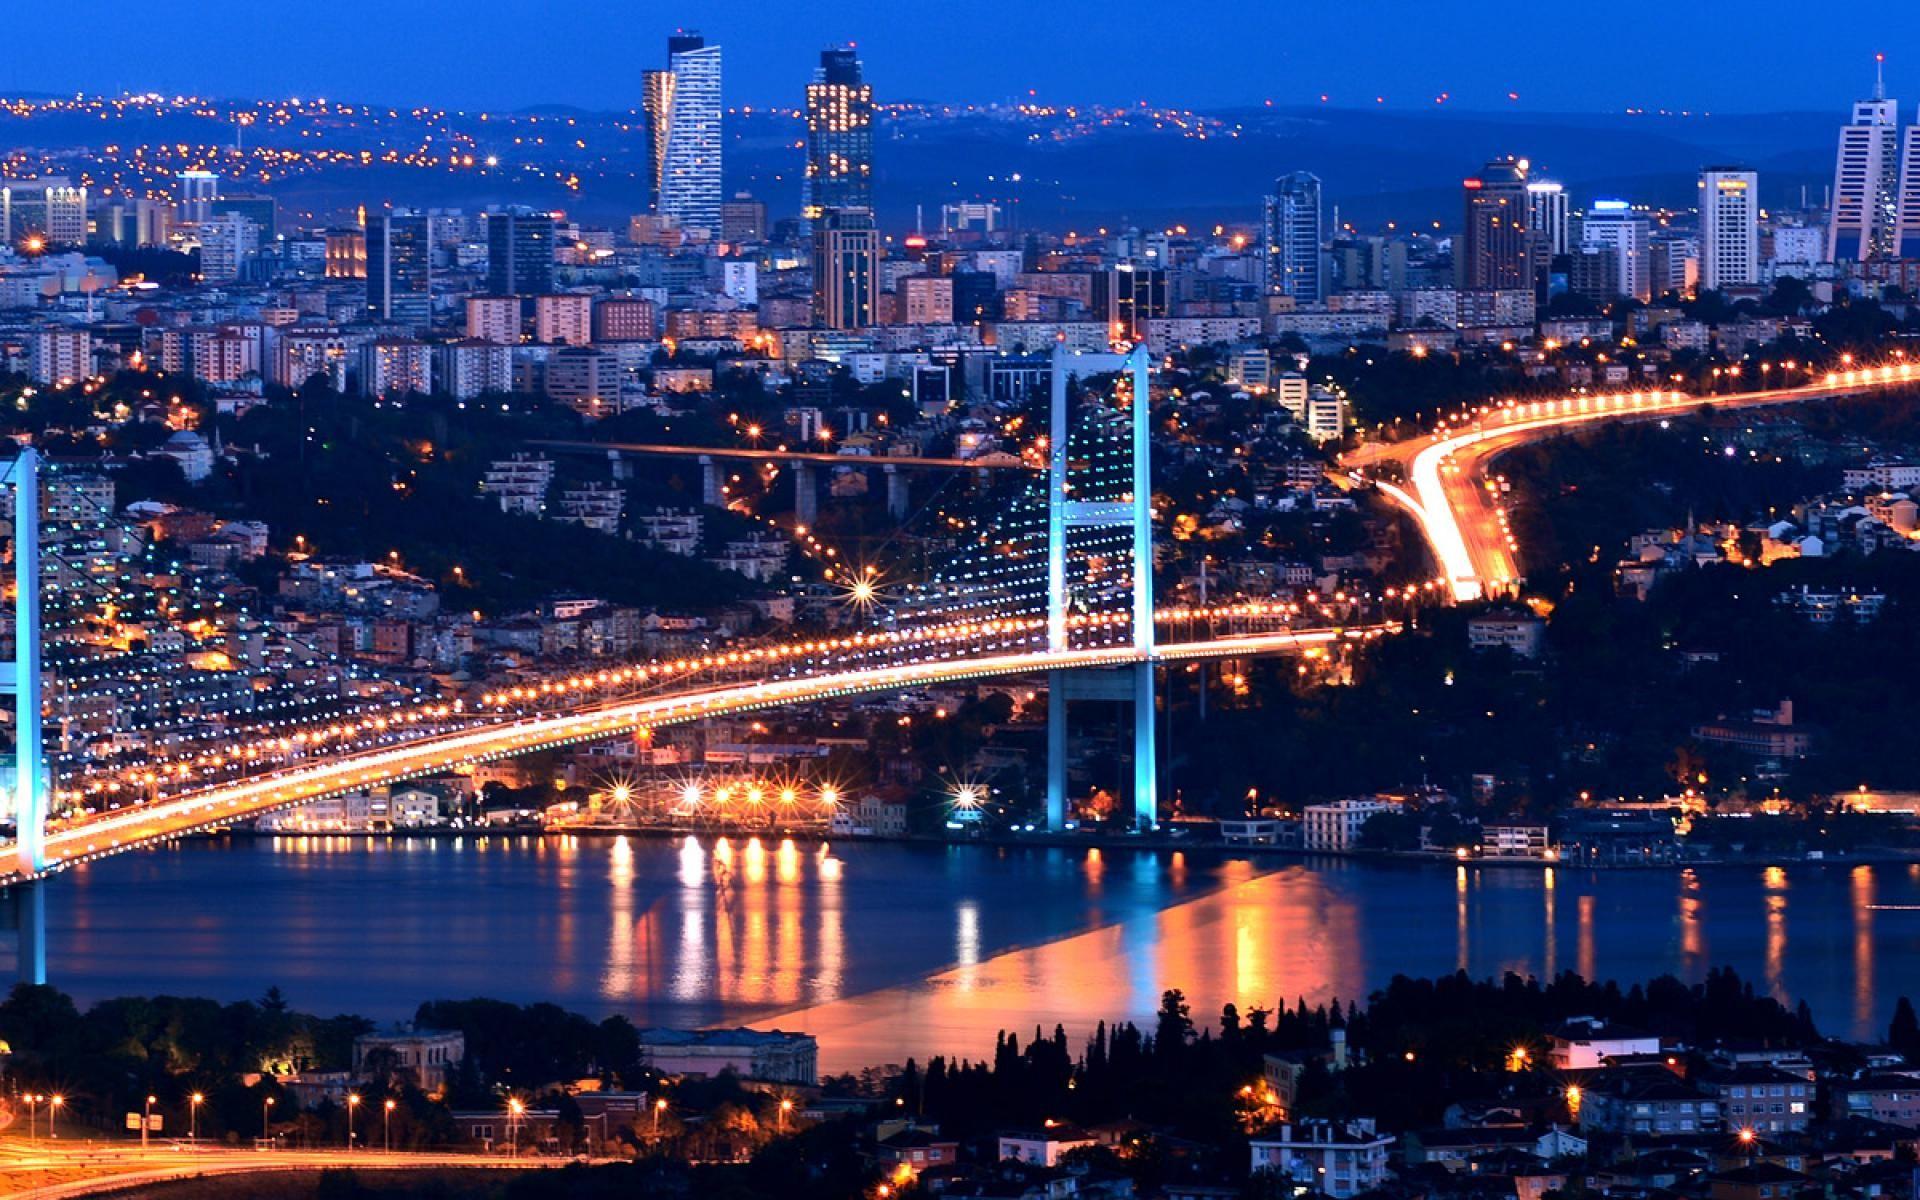 Turkey Wallpapers HD Ultra High Quality